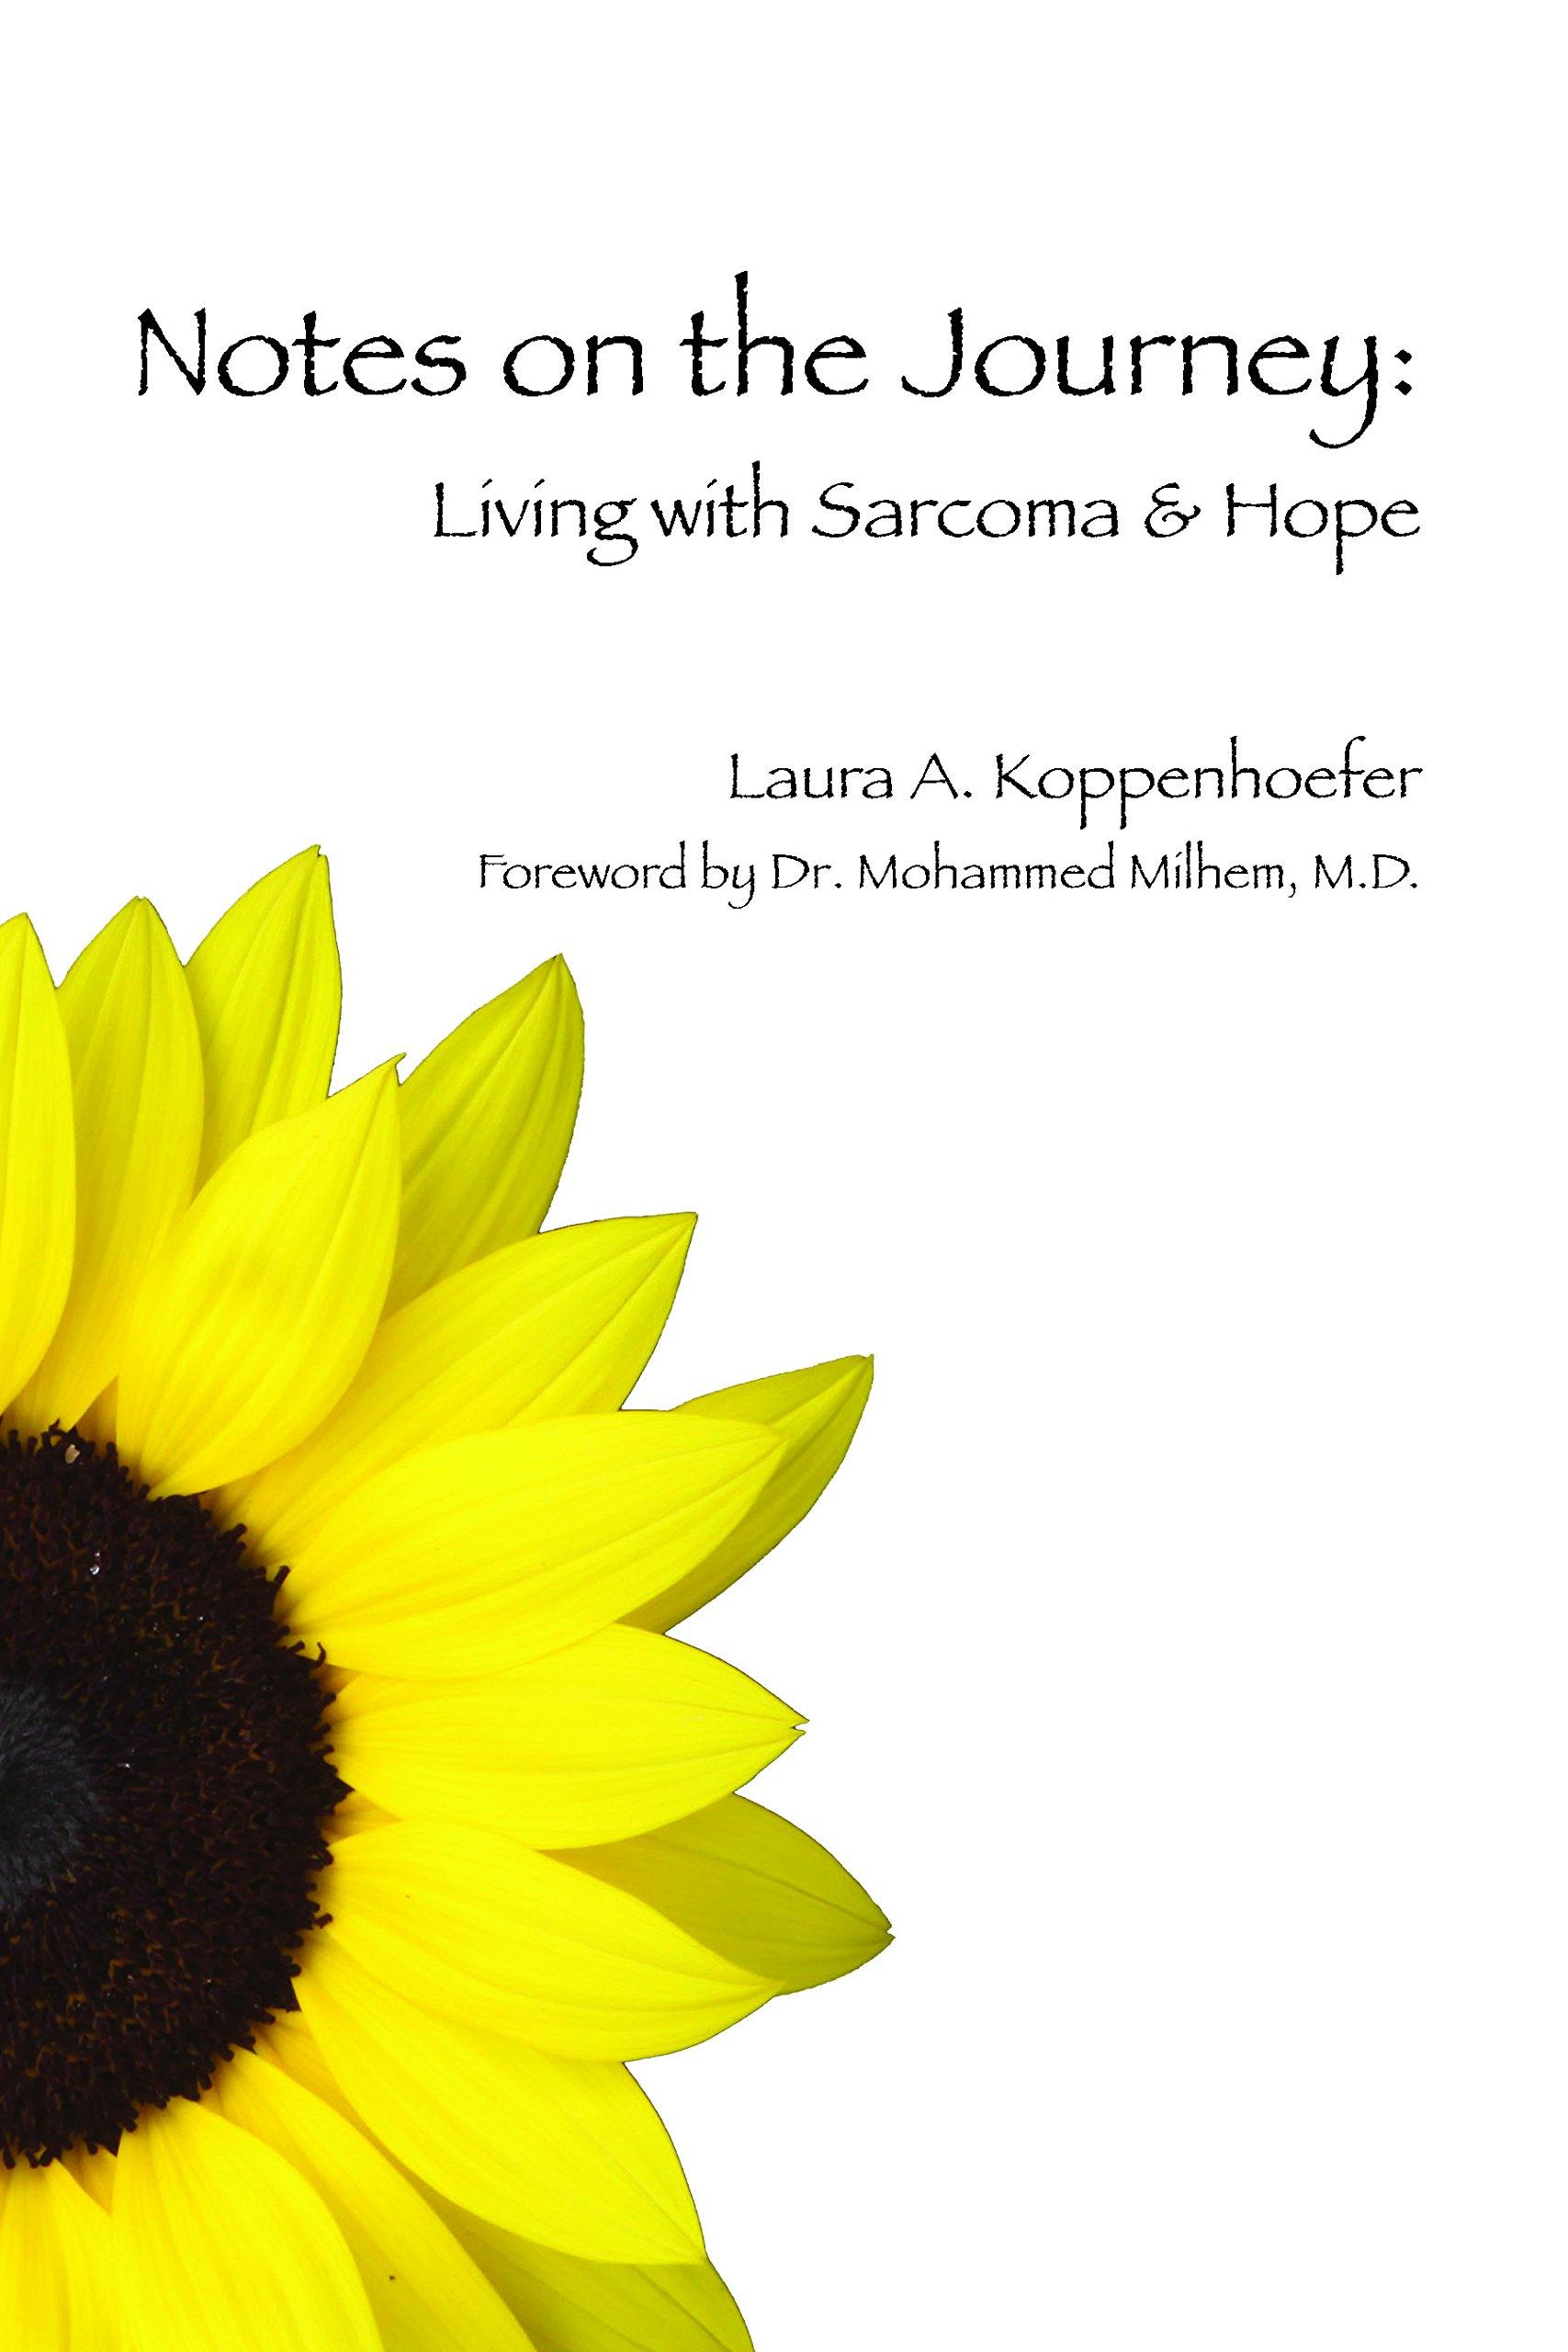 Sarcoma cancer flower. Aproape de Suflet (Aproapedesuflet) on Pinterest